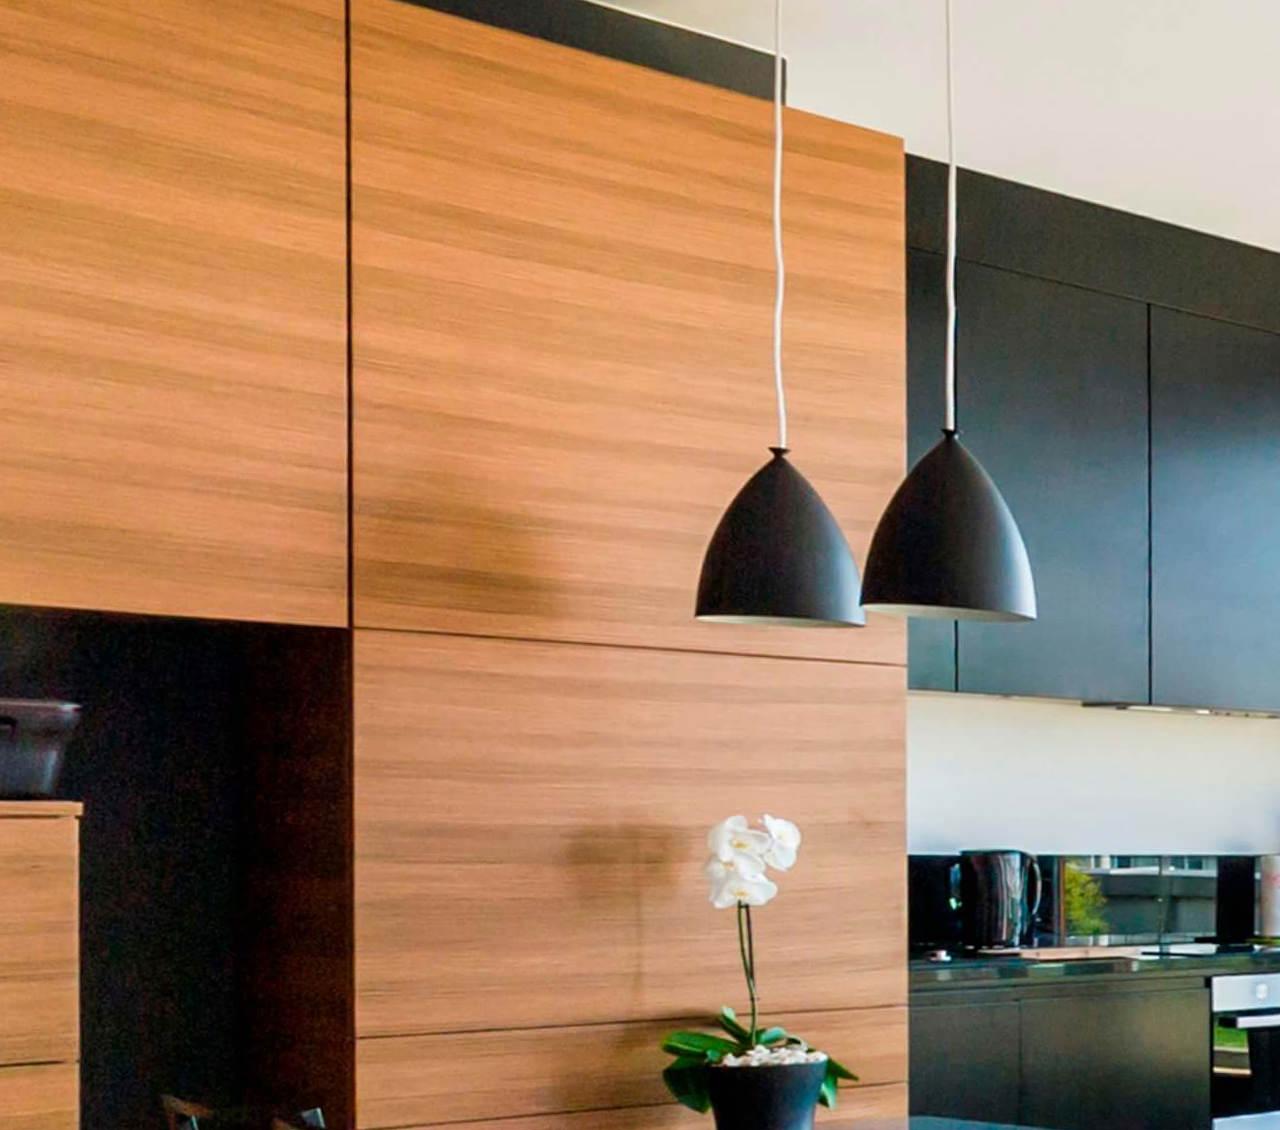 glen-ridge-kitchen-and-bathroom-remodeling